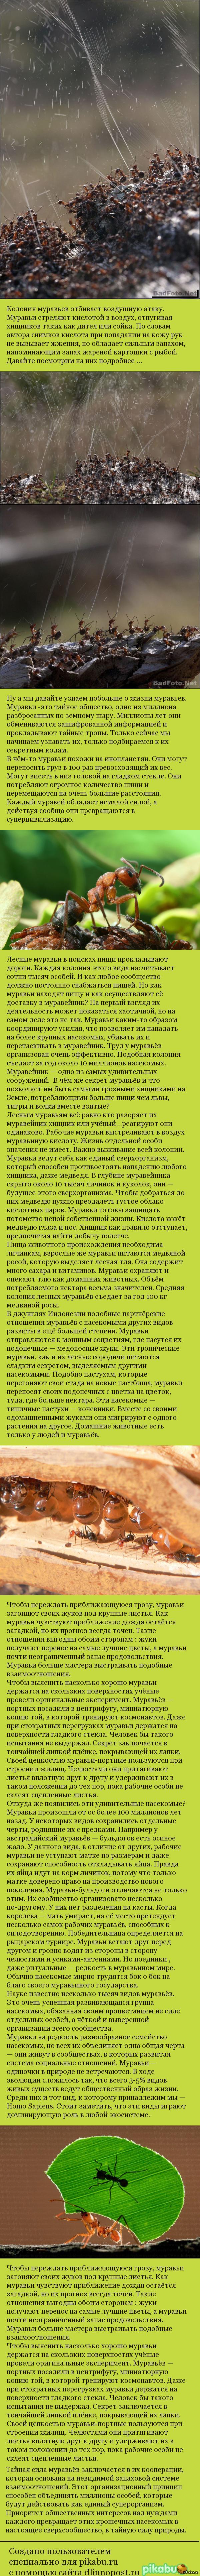 http://s4.pikabu.ru/post_img/2014/06/23/6/1403507063_1544025056.jpg